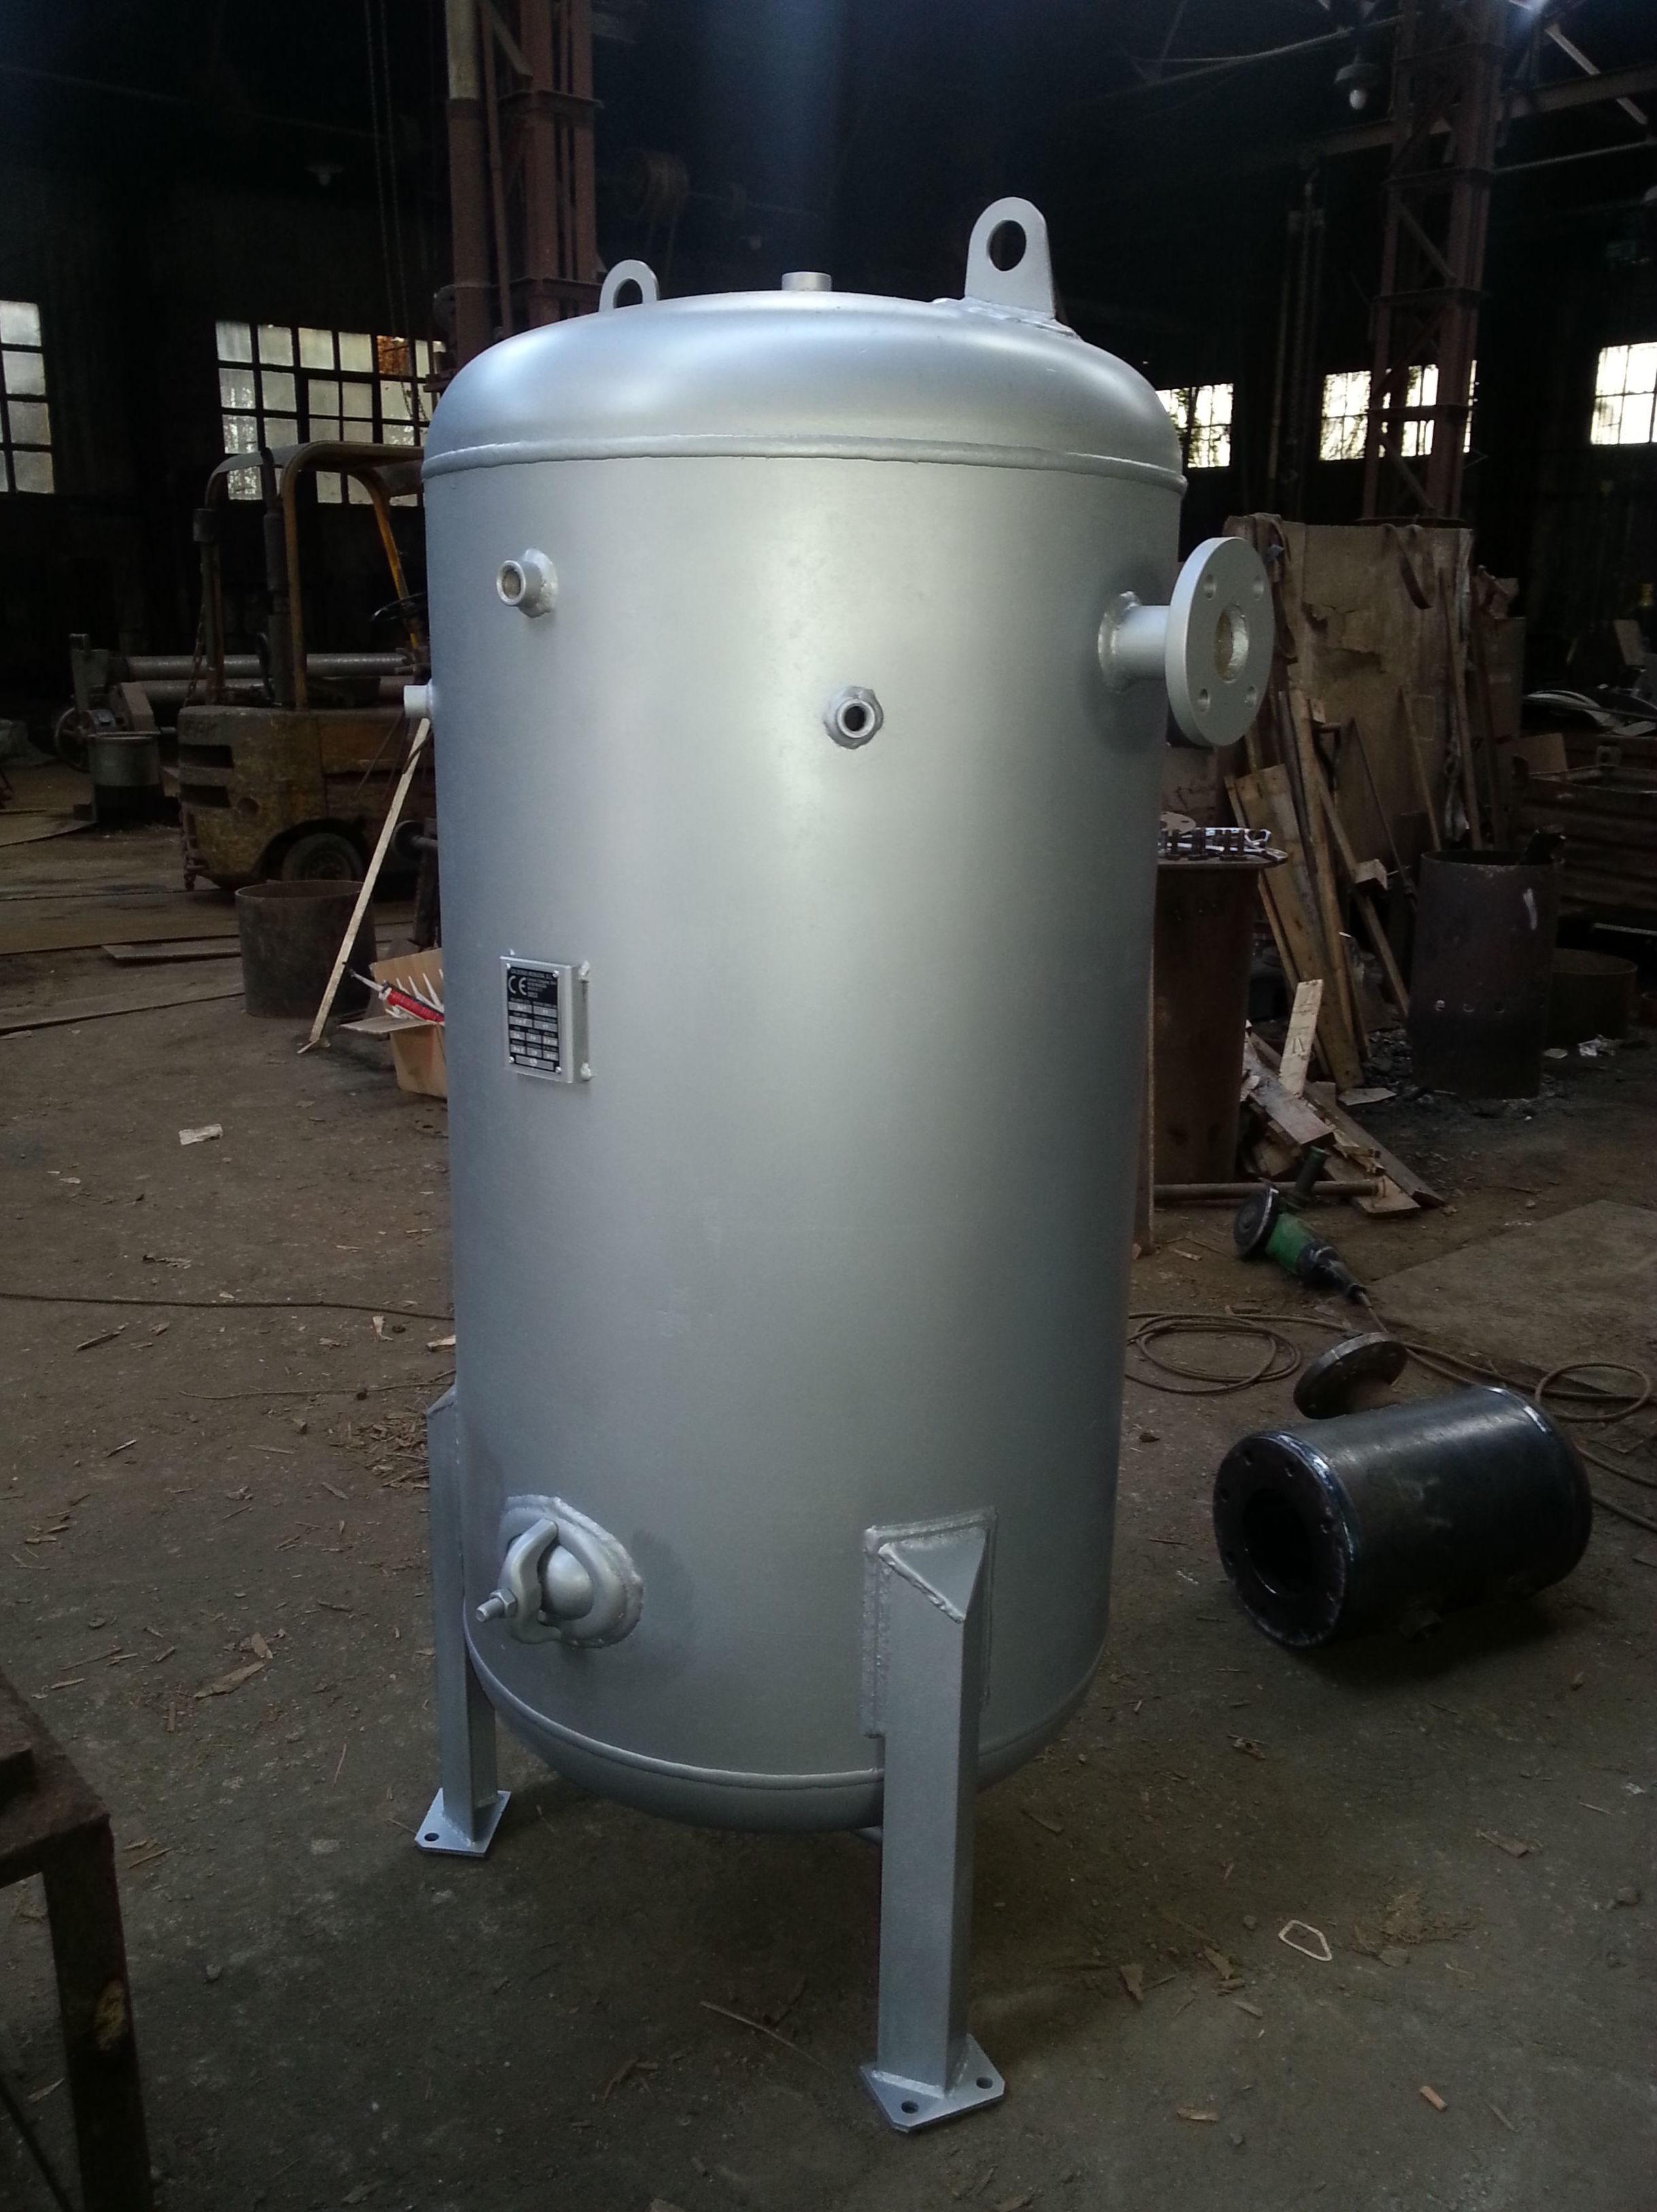 Depósito verical 400 lts aire comprimido